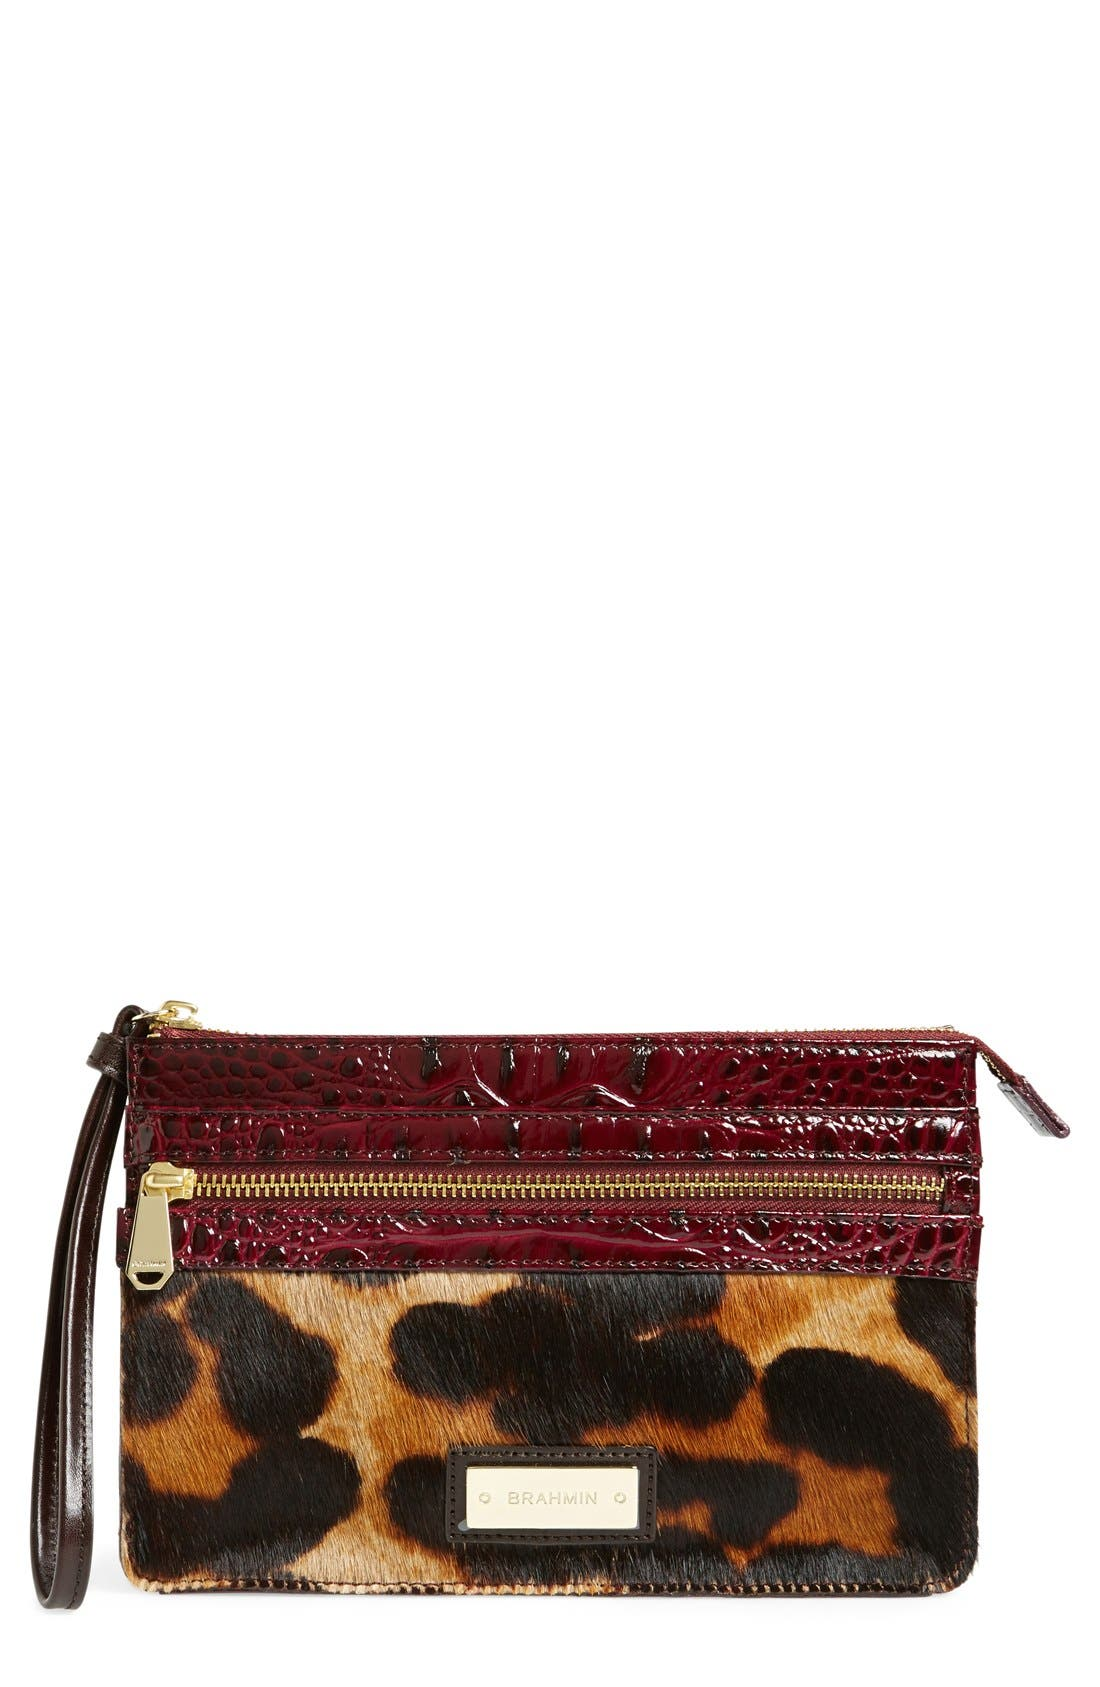 Main Image - Brahmin'Winnie' Genuine Calf Hair & Leather Wristlet